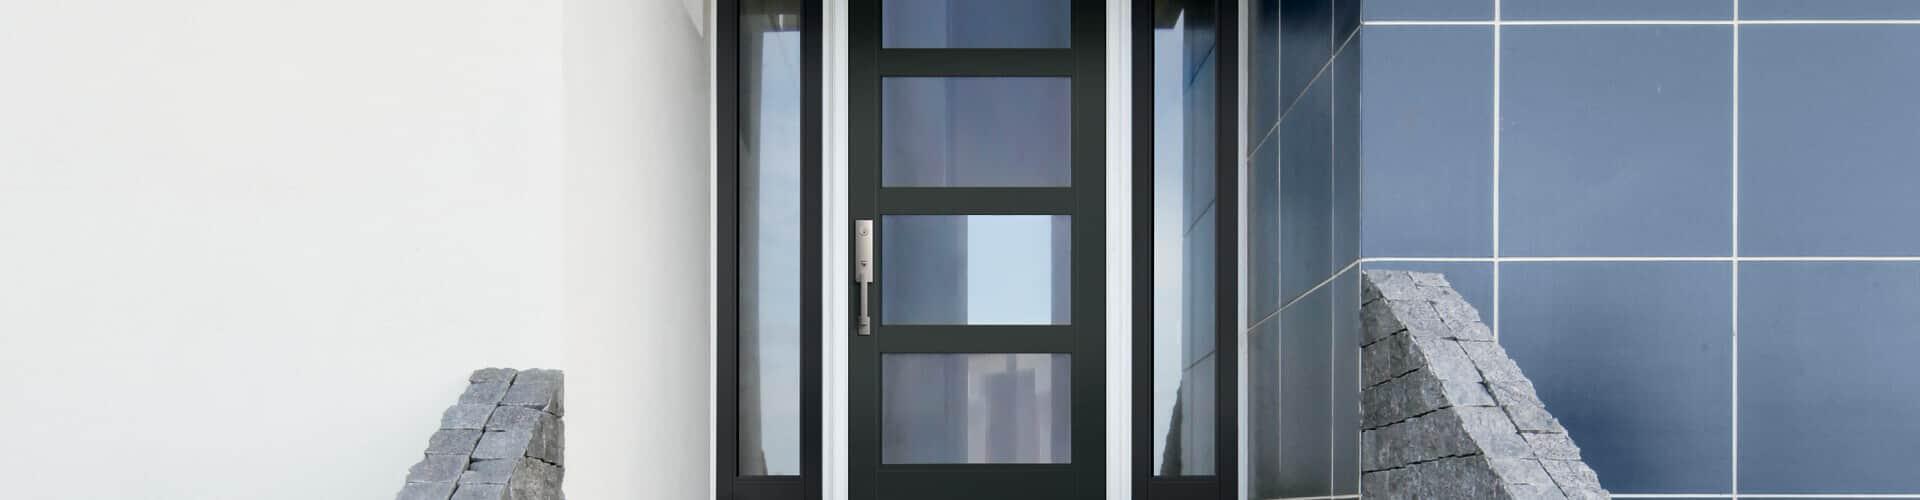 entry door sidelights pella